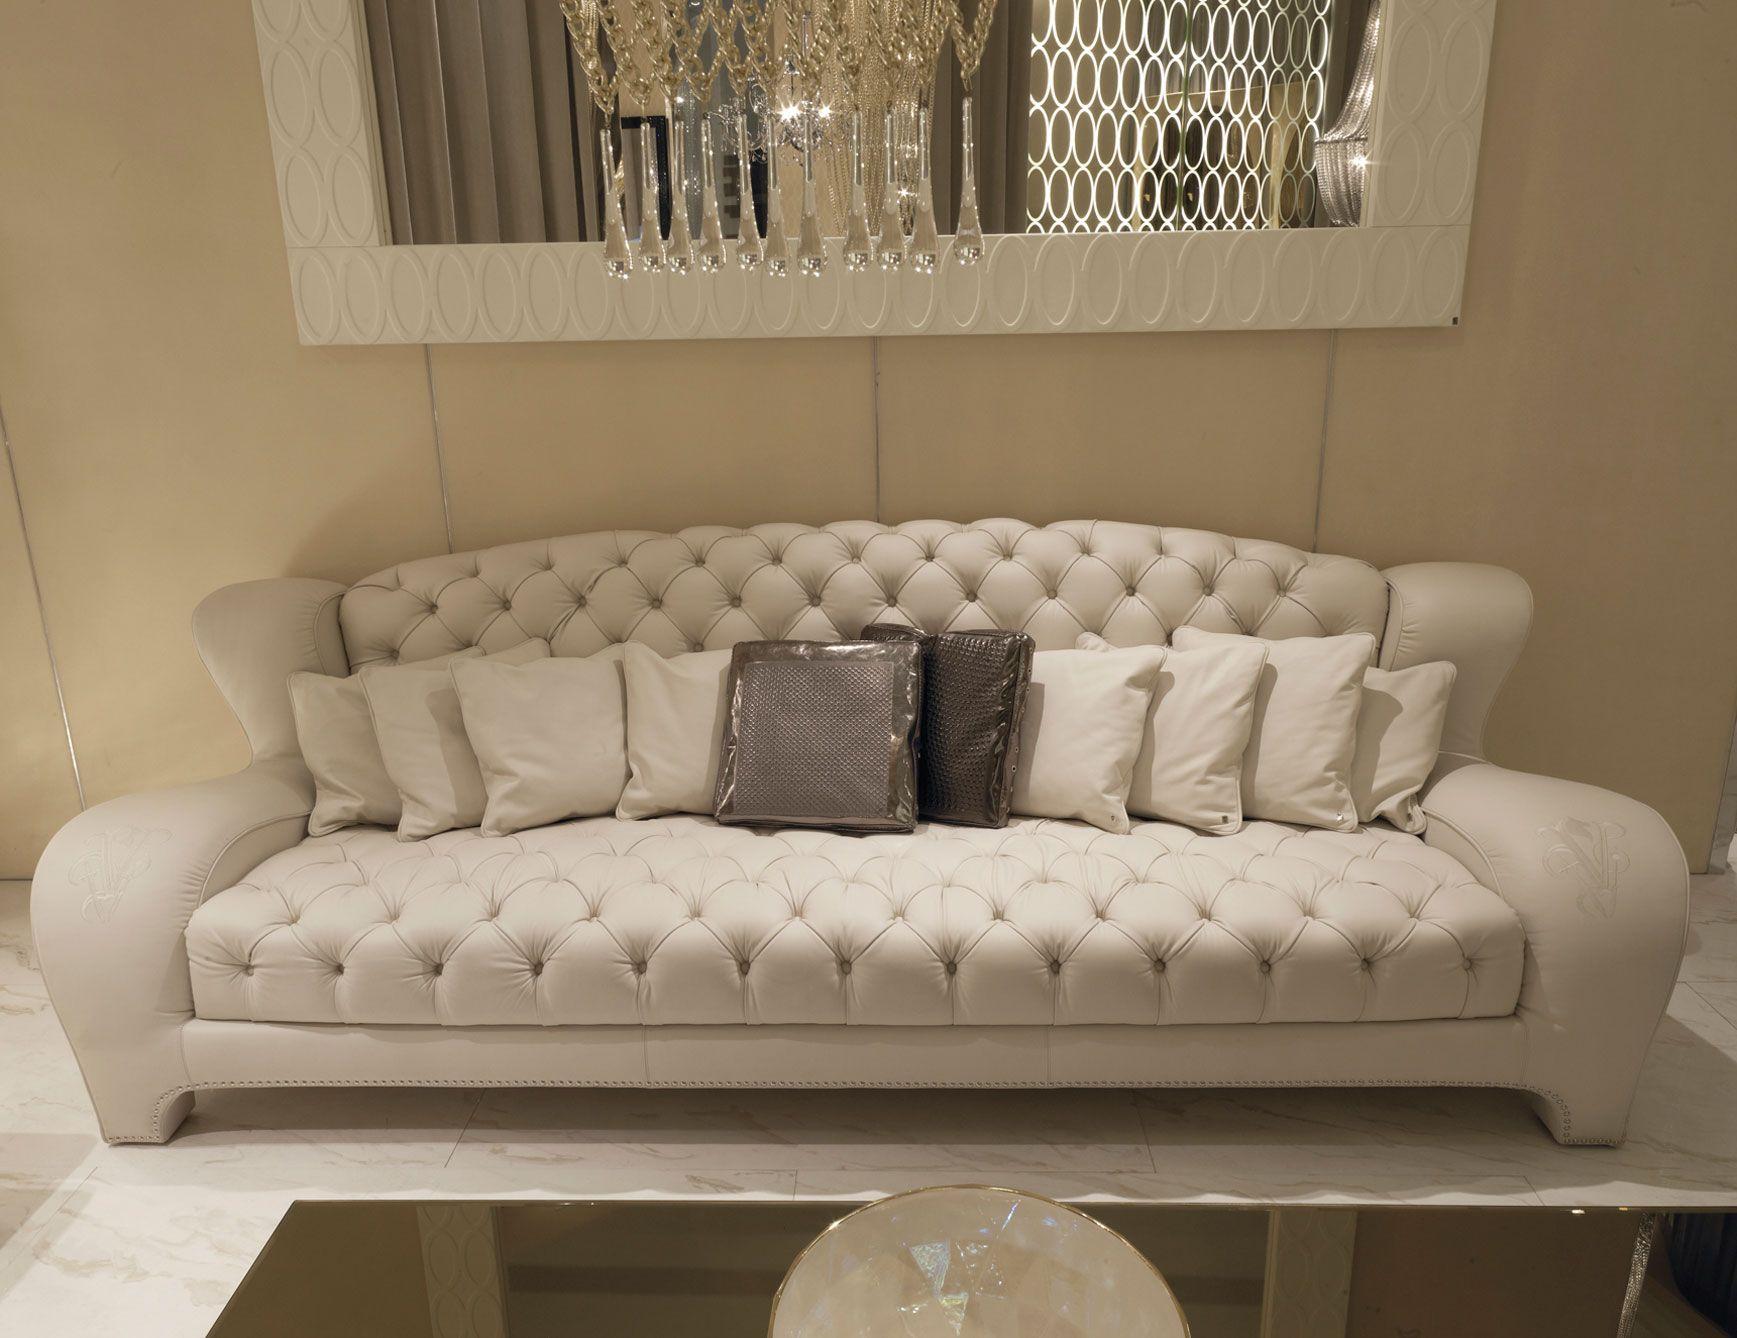 Trendy White Big Sofa Ideas Combined Incredible End Table Design Modern Sofa Table Ideas All Modern Furniture Contemporary Sofa Design Modern Sofa Table